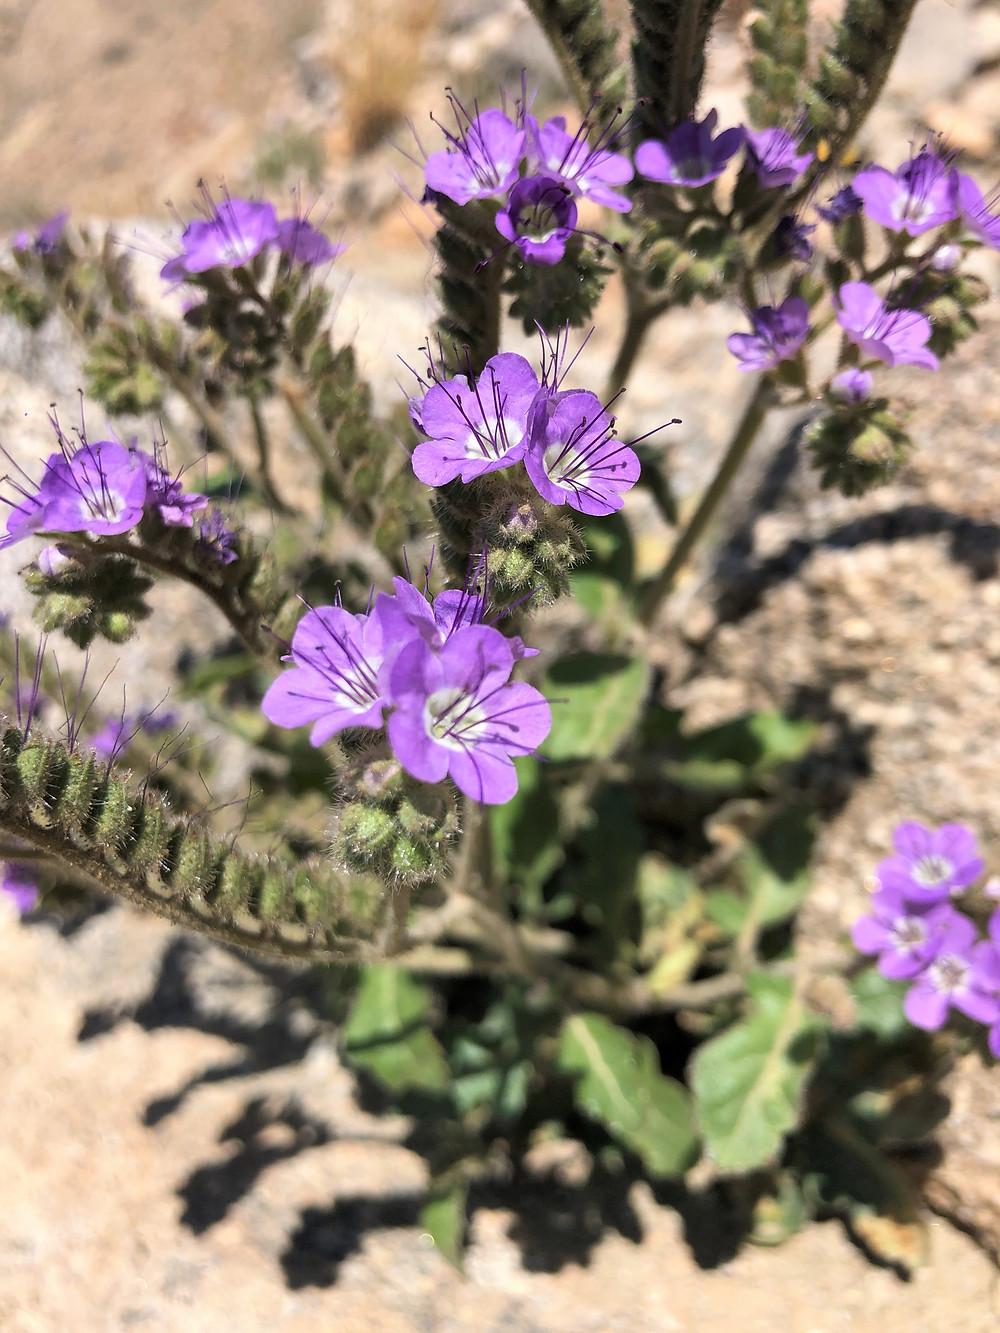 Flowering Notch-leaf scorpion-weed along Indio Hills Badland Loop Trail